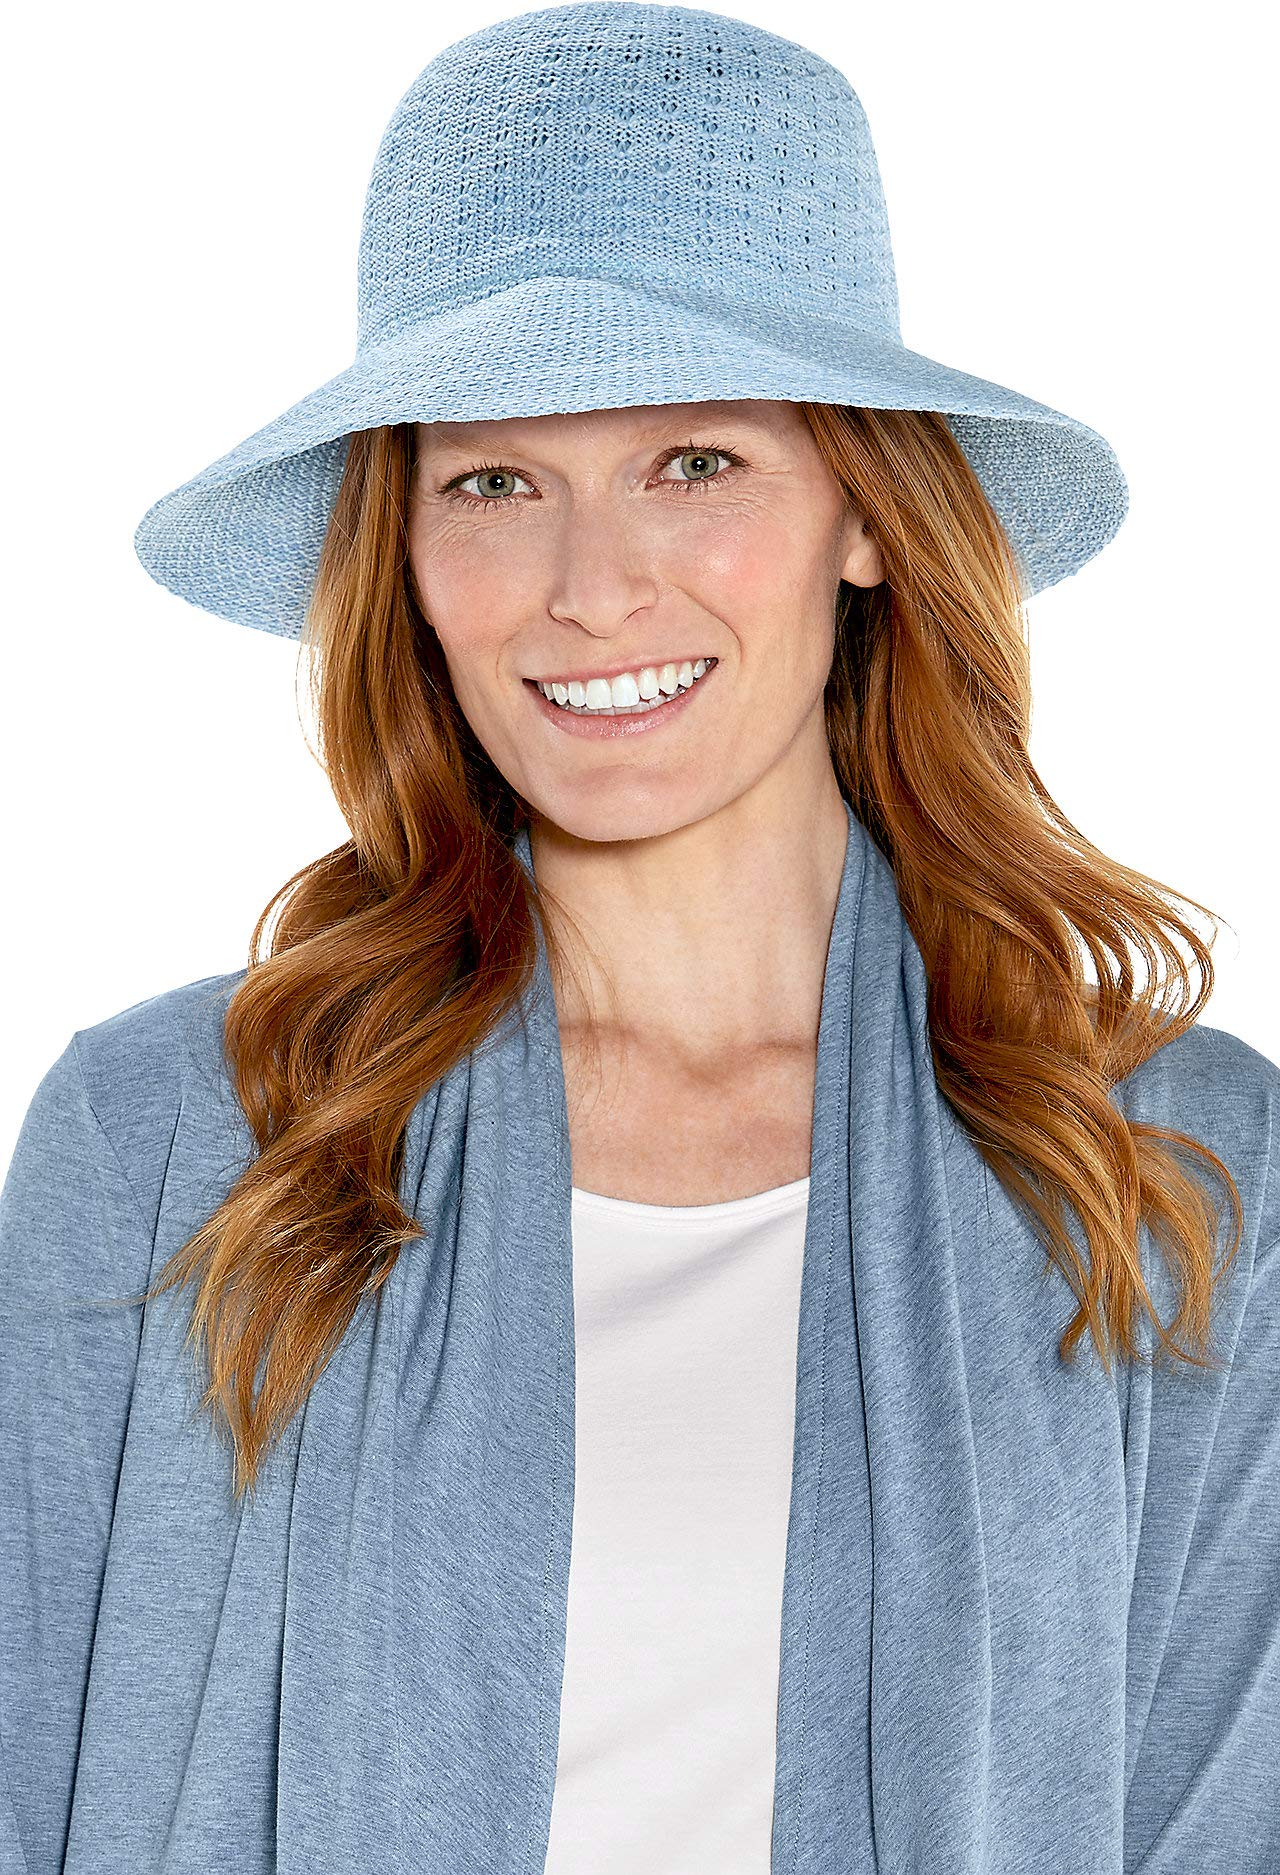 Coolibar UPF 50+ Women's Marina Sun Hat - Sun Protective (One Size- Vintage Blue Space Dye)